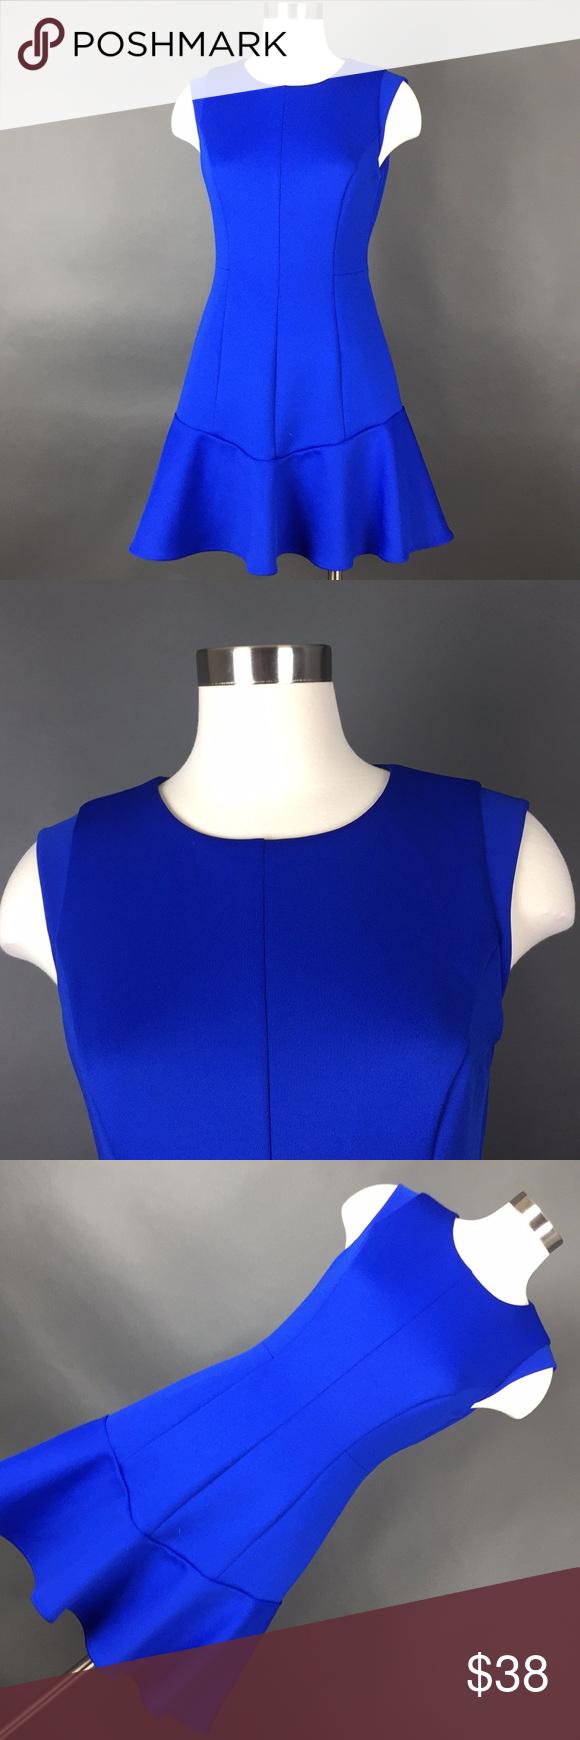 1 Day Sale Vince Camuto Royal Blue Dress 6 Royal Blue Dress Blue Dresses Gorgeous Dresses [ 1740 x 580 Pixel ]